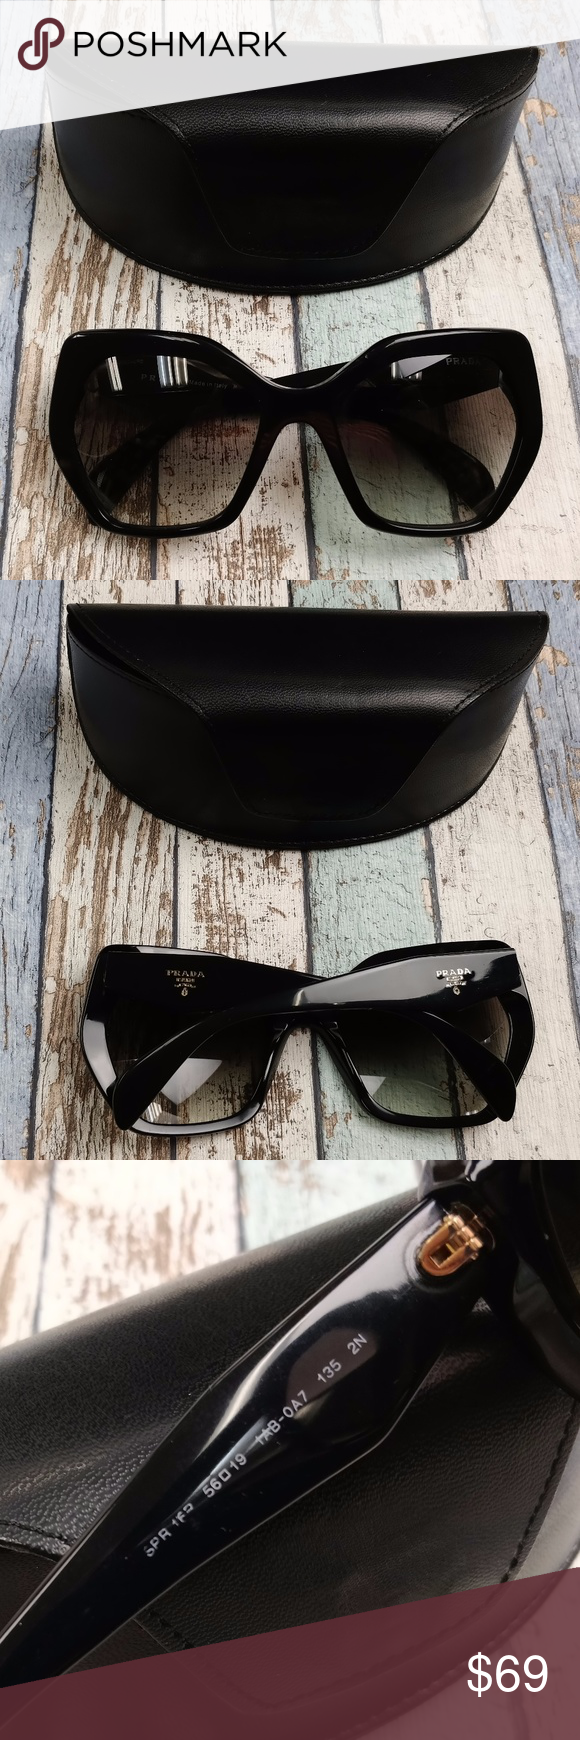 e64c9f45a6654 Italy! Prada SPR16P Women s Sunglasses  EUG345 Lens Condition  Lenses are  almost fine